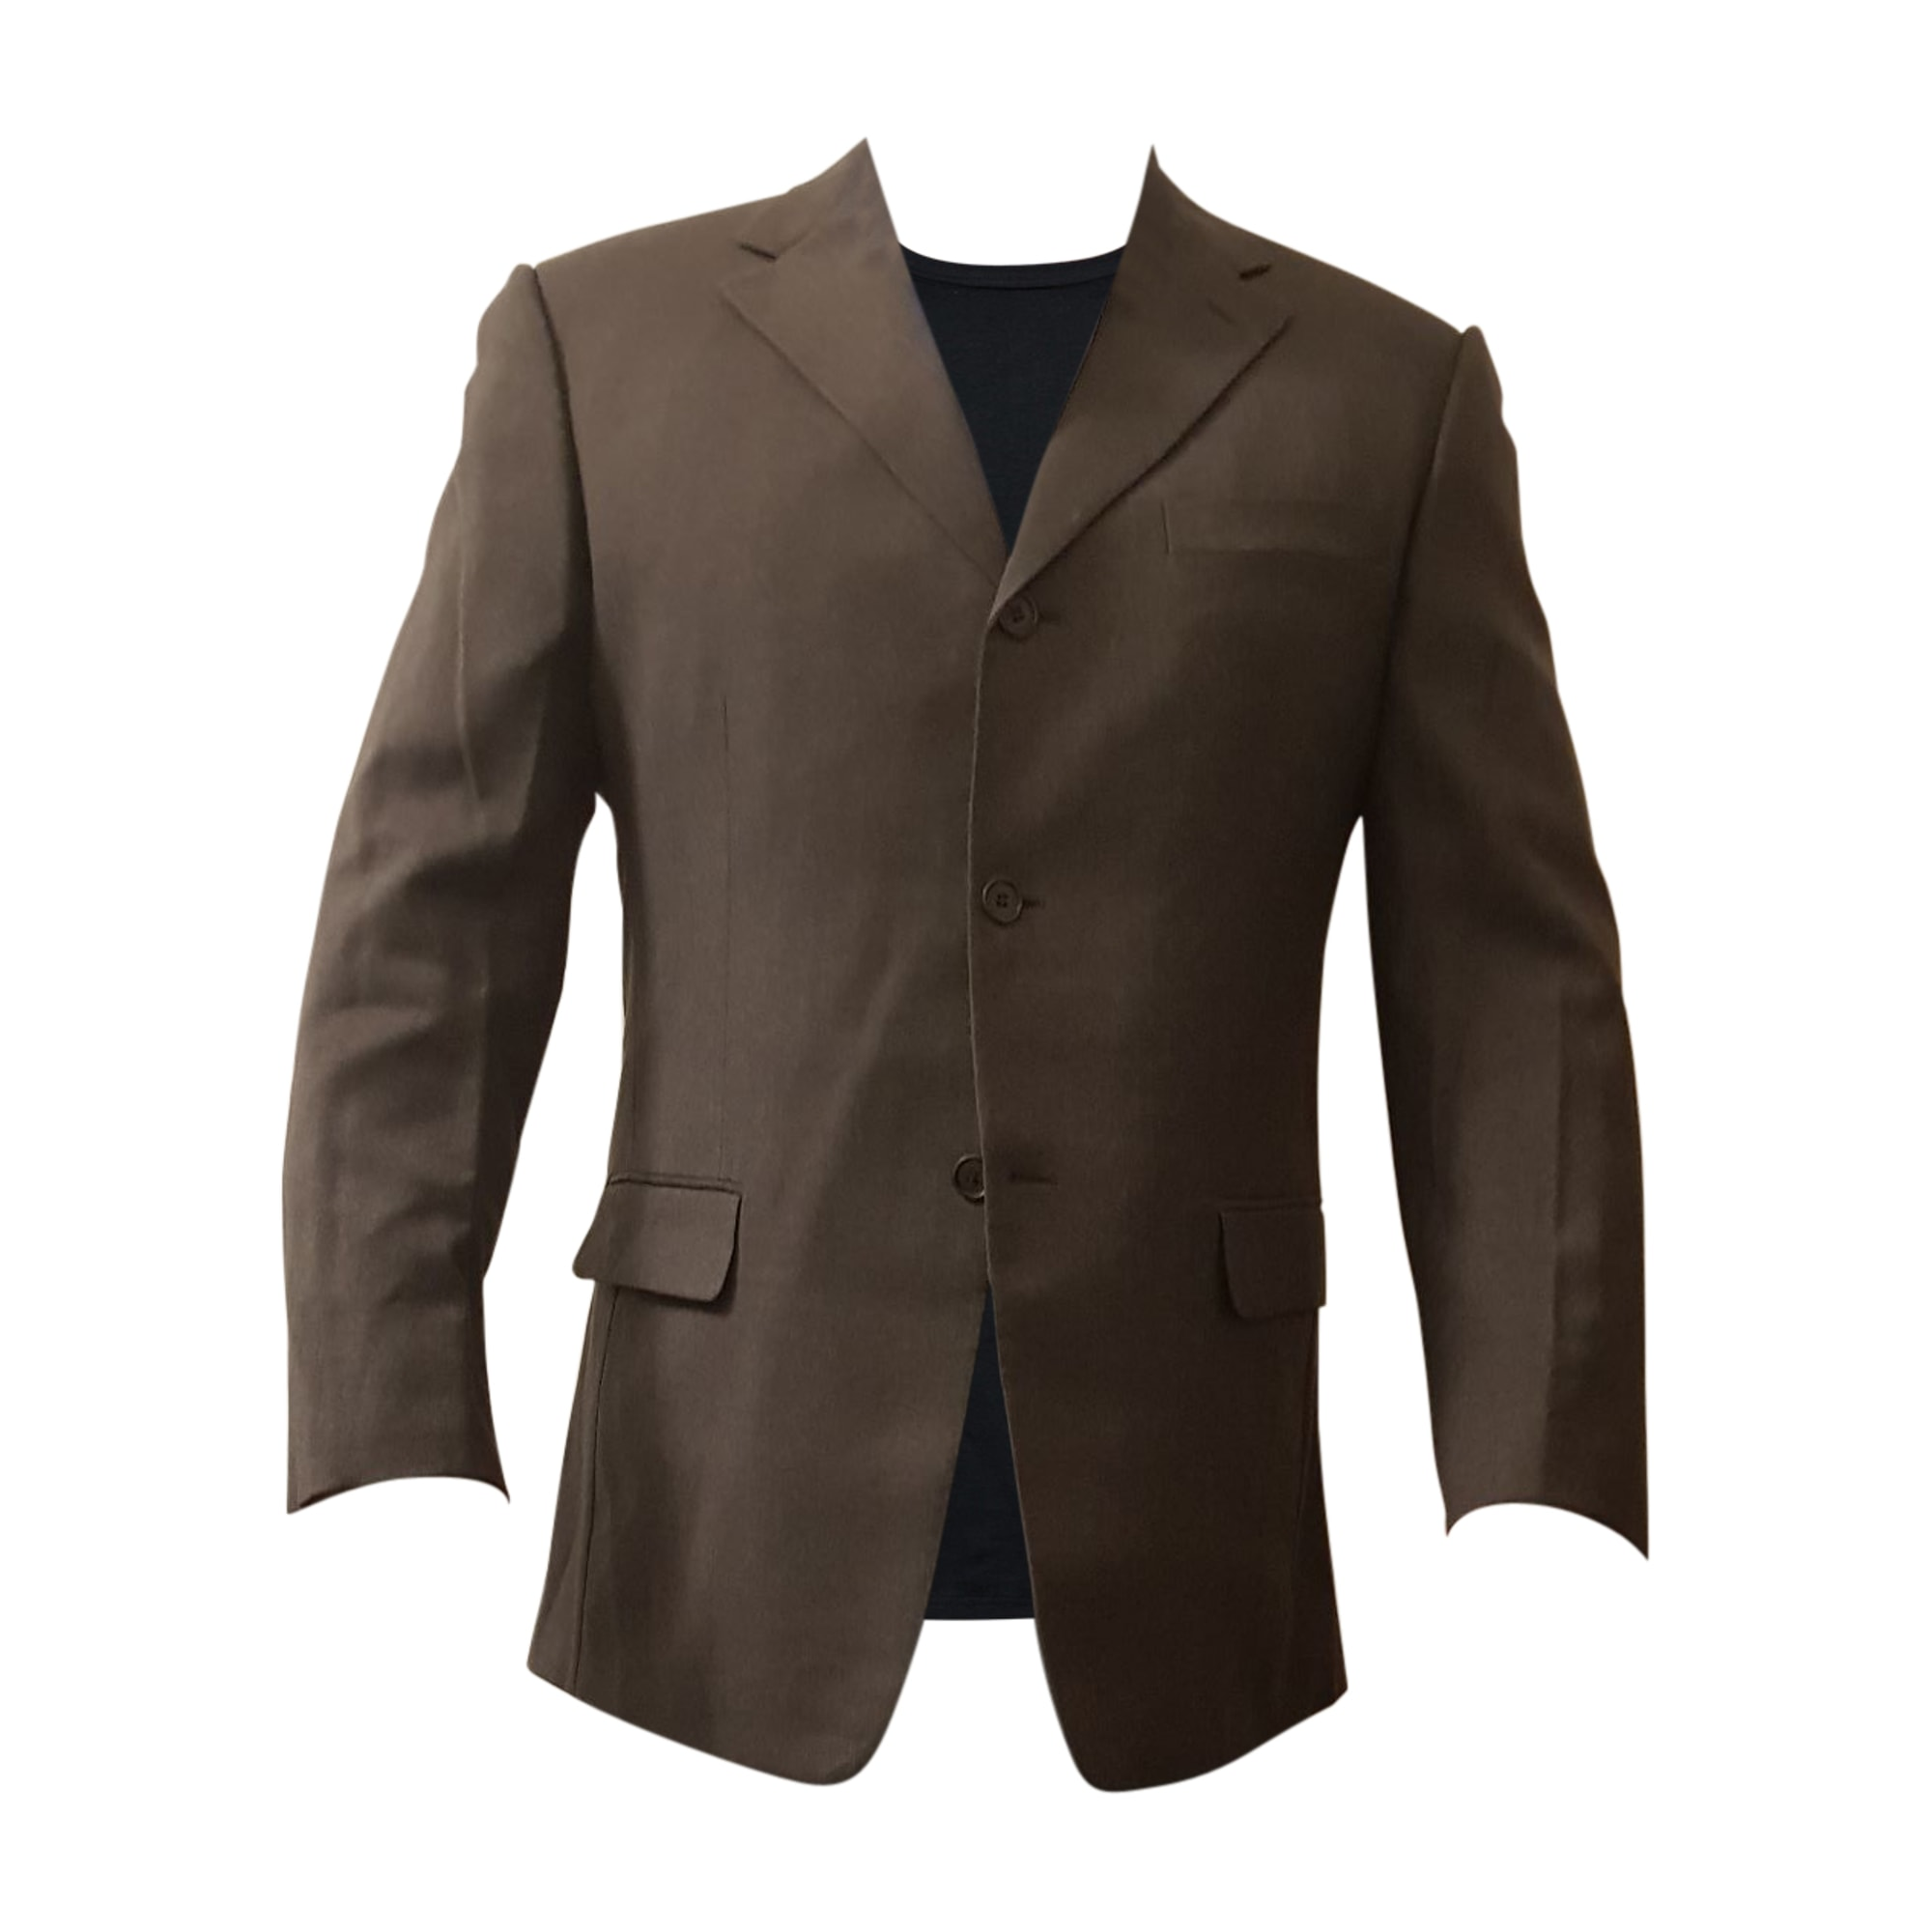 Complete Suit SALVATORE FERRAGAMO Gray, charcoal